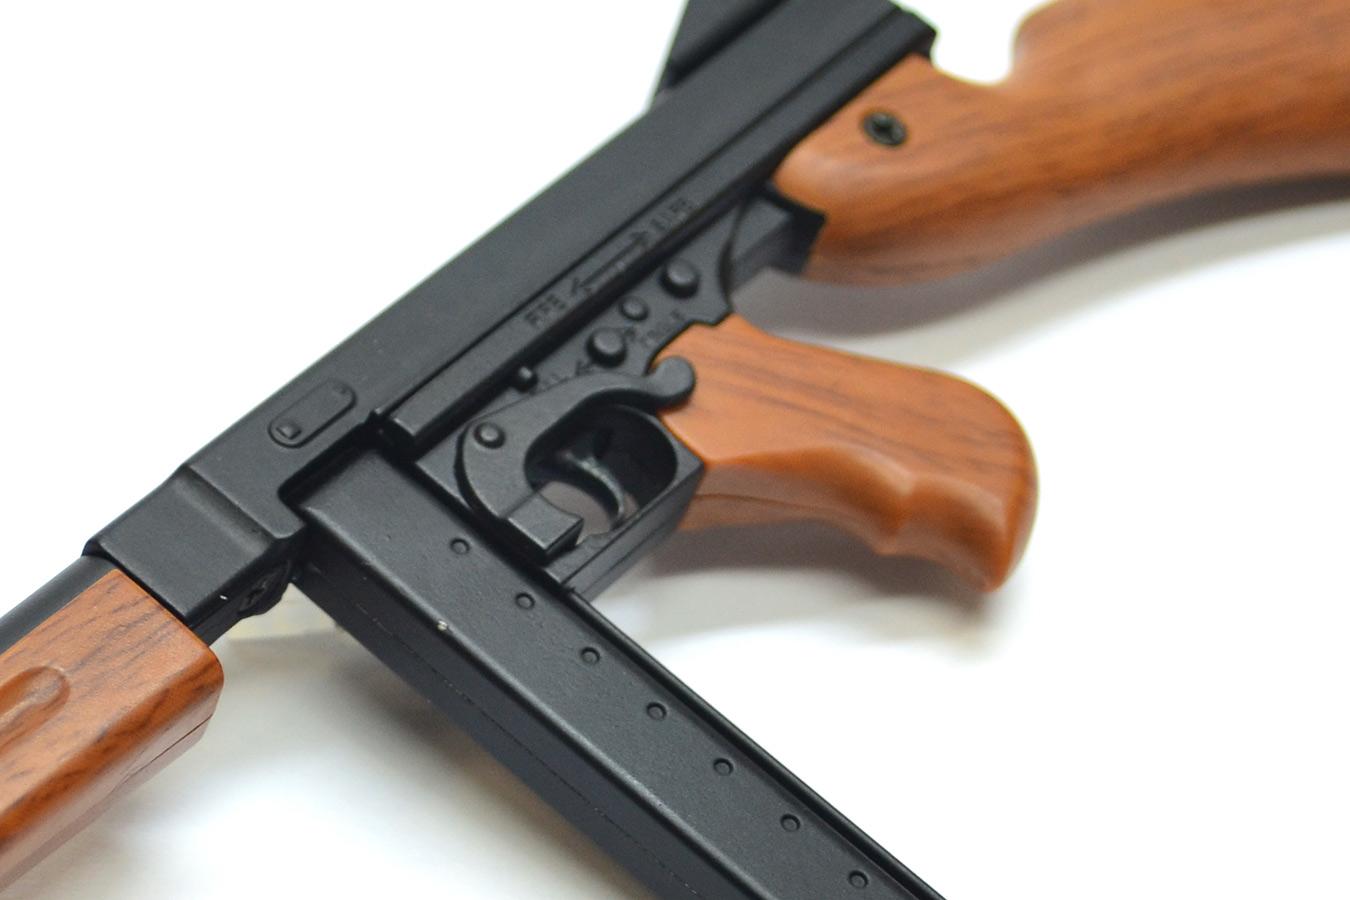 Пистолет-пулемёт Томпсона изображение 5